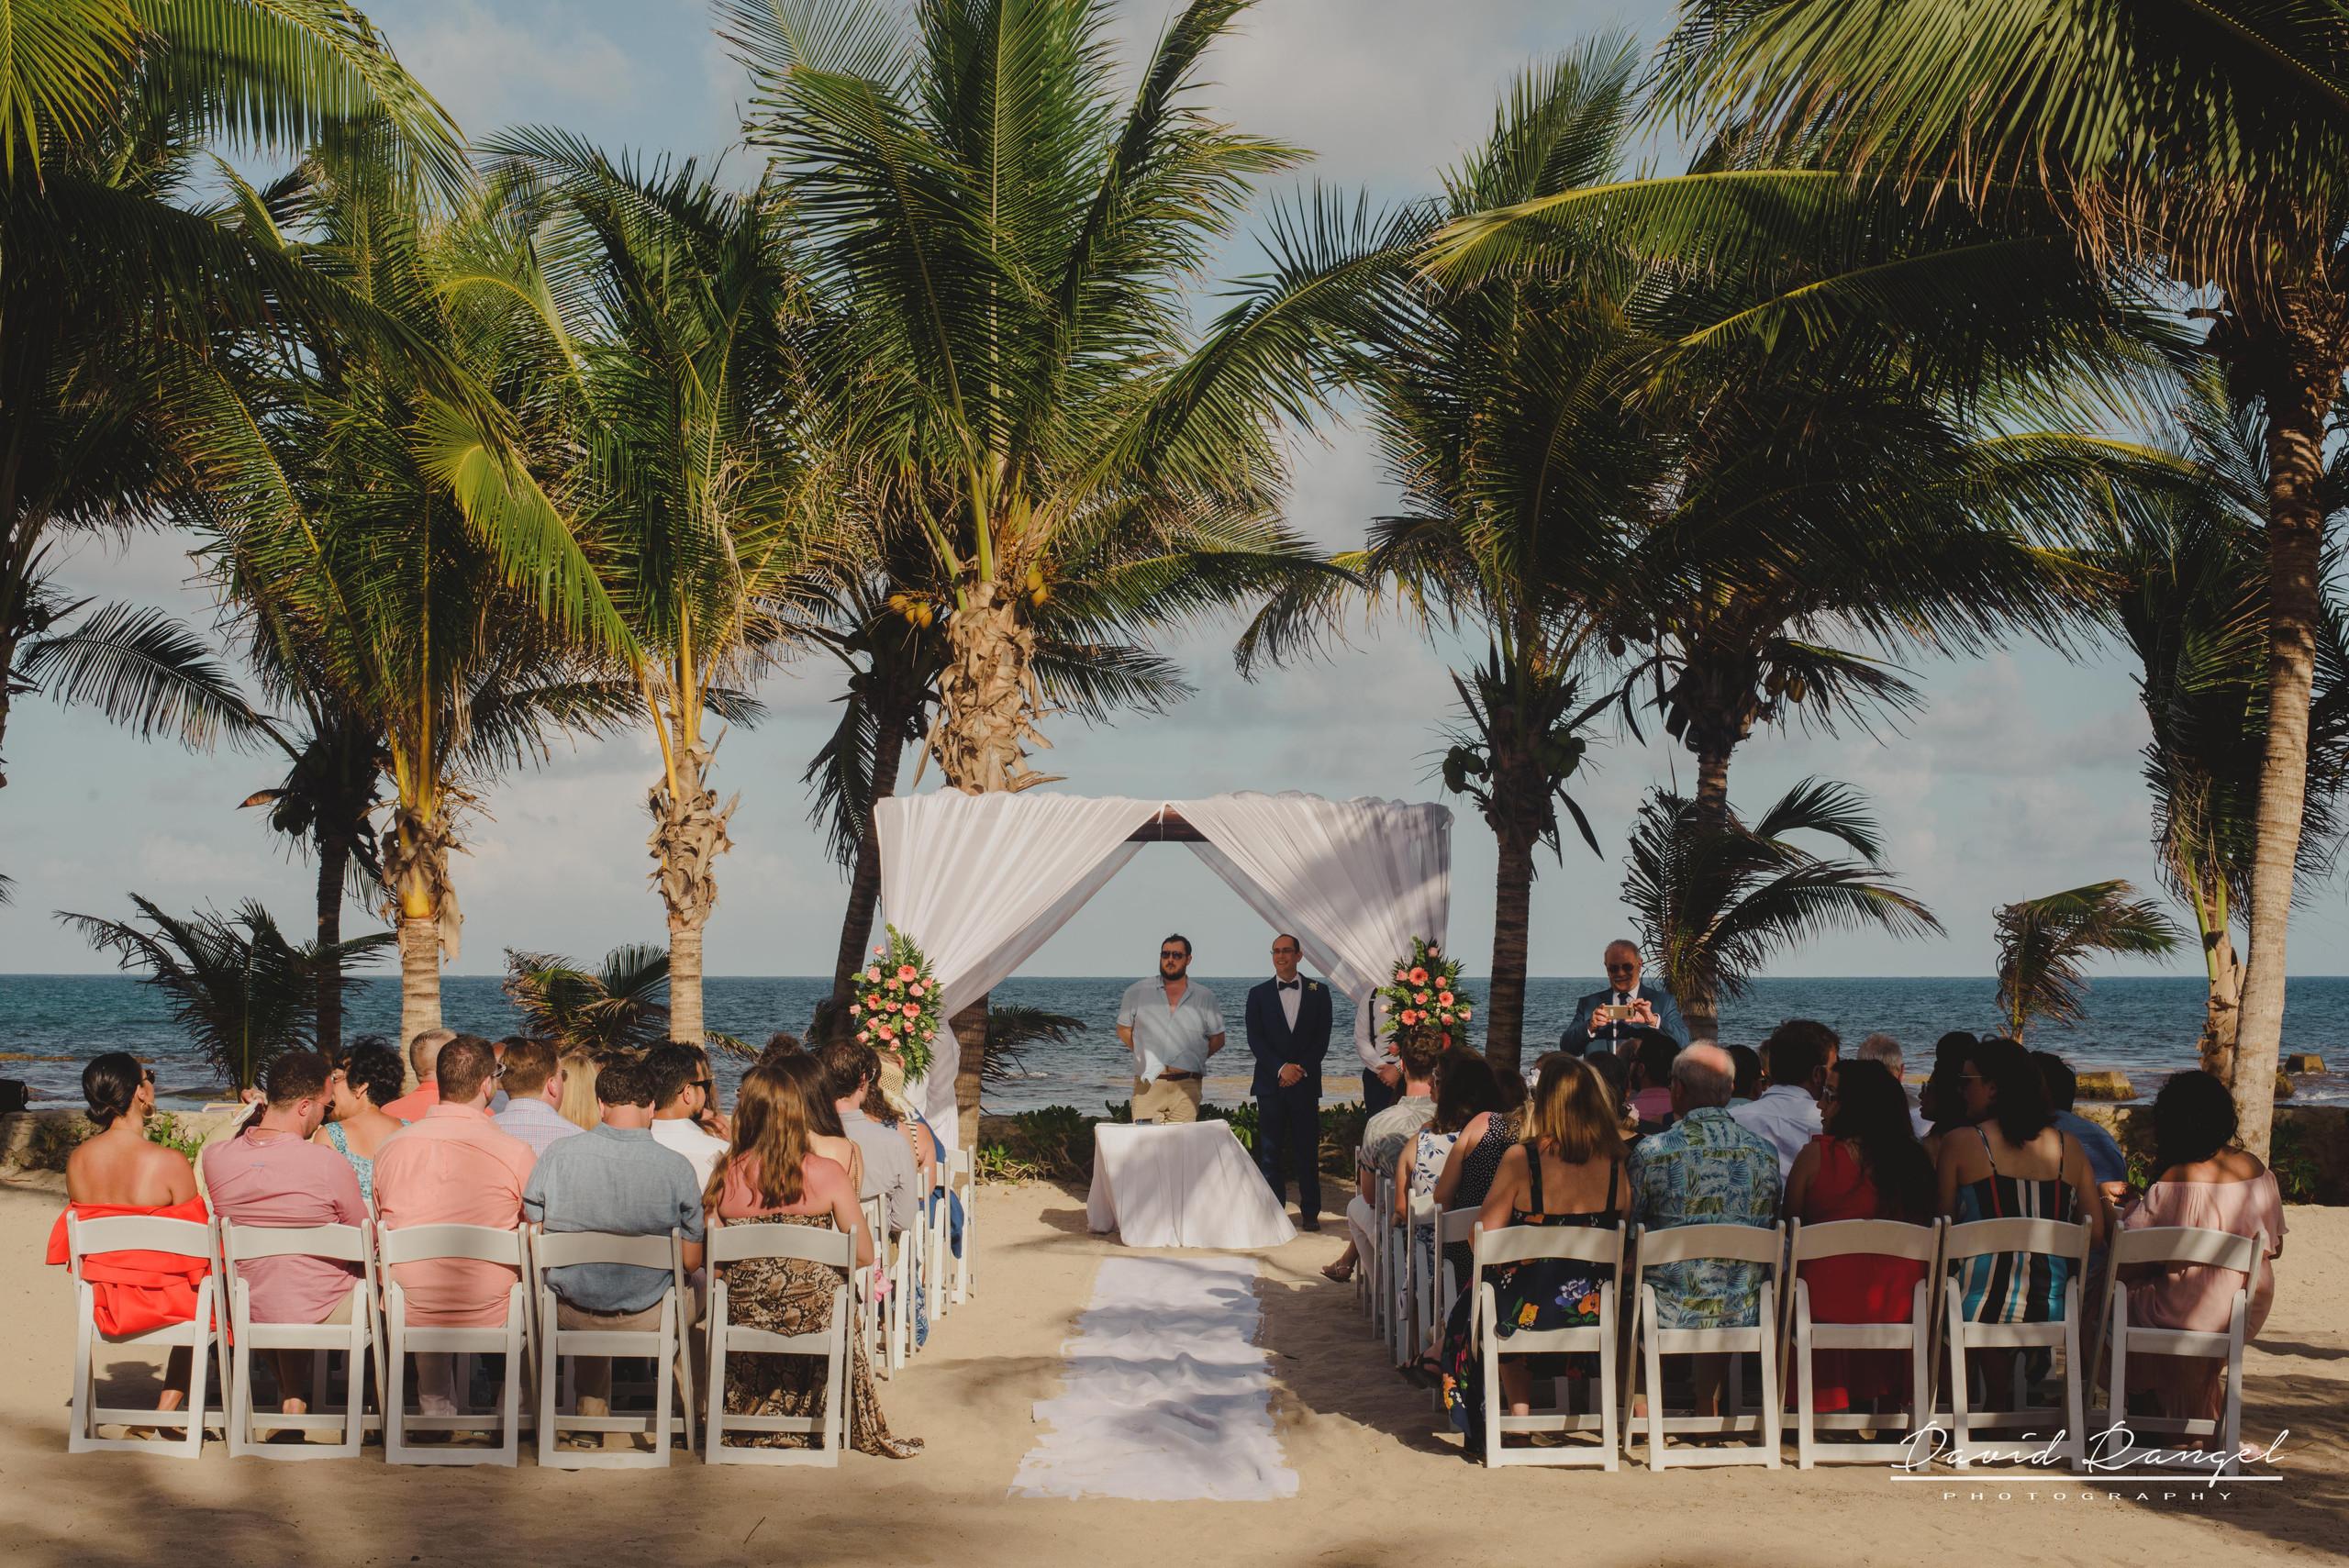 wedding+gazebo+beach+ceremony+photo+groom+aisle